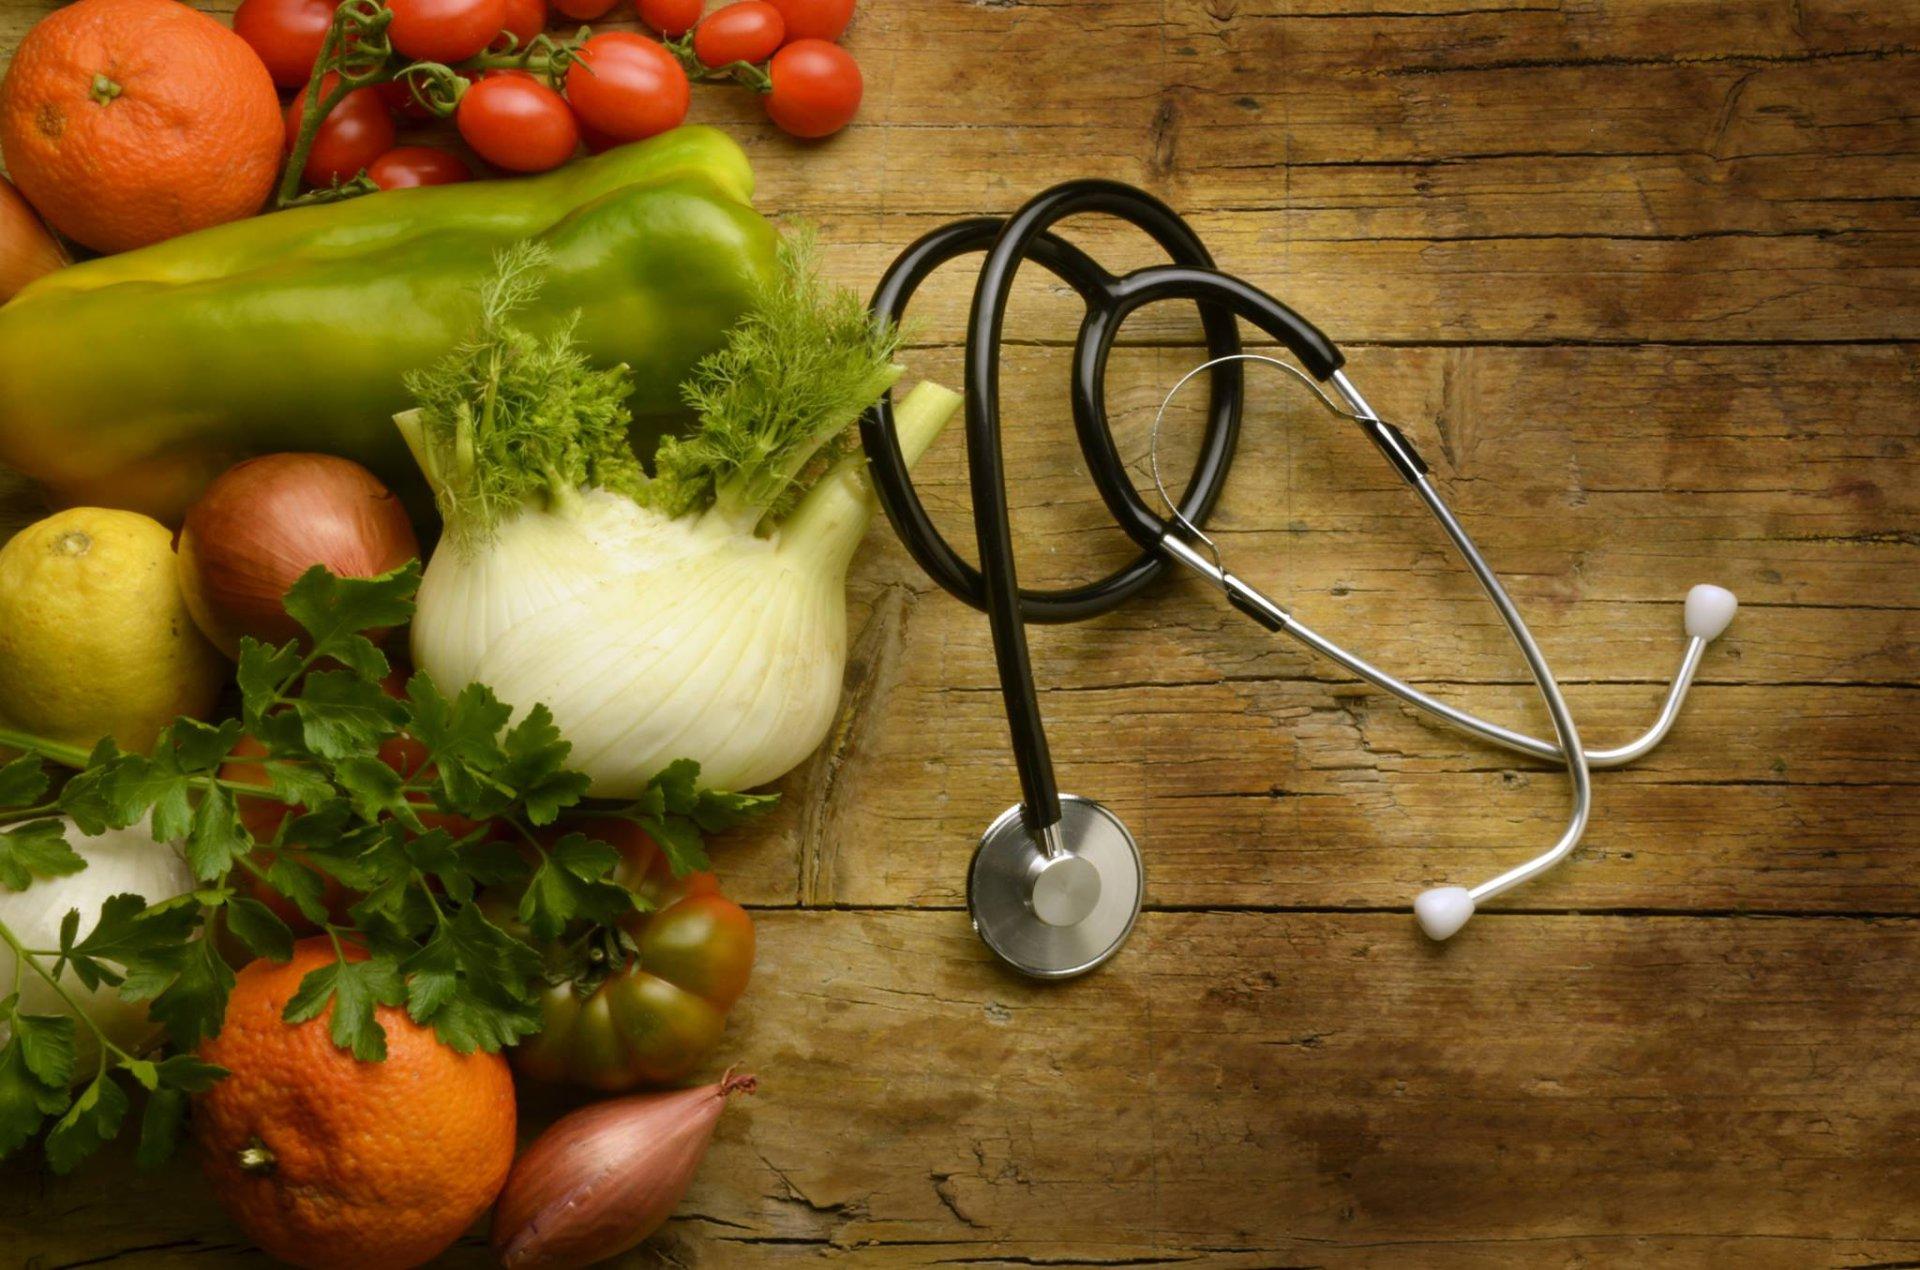 Dieta hipertenzijai. Kaip valgyti esant aukštam slėgiui? - Hipertenzija November